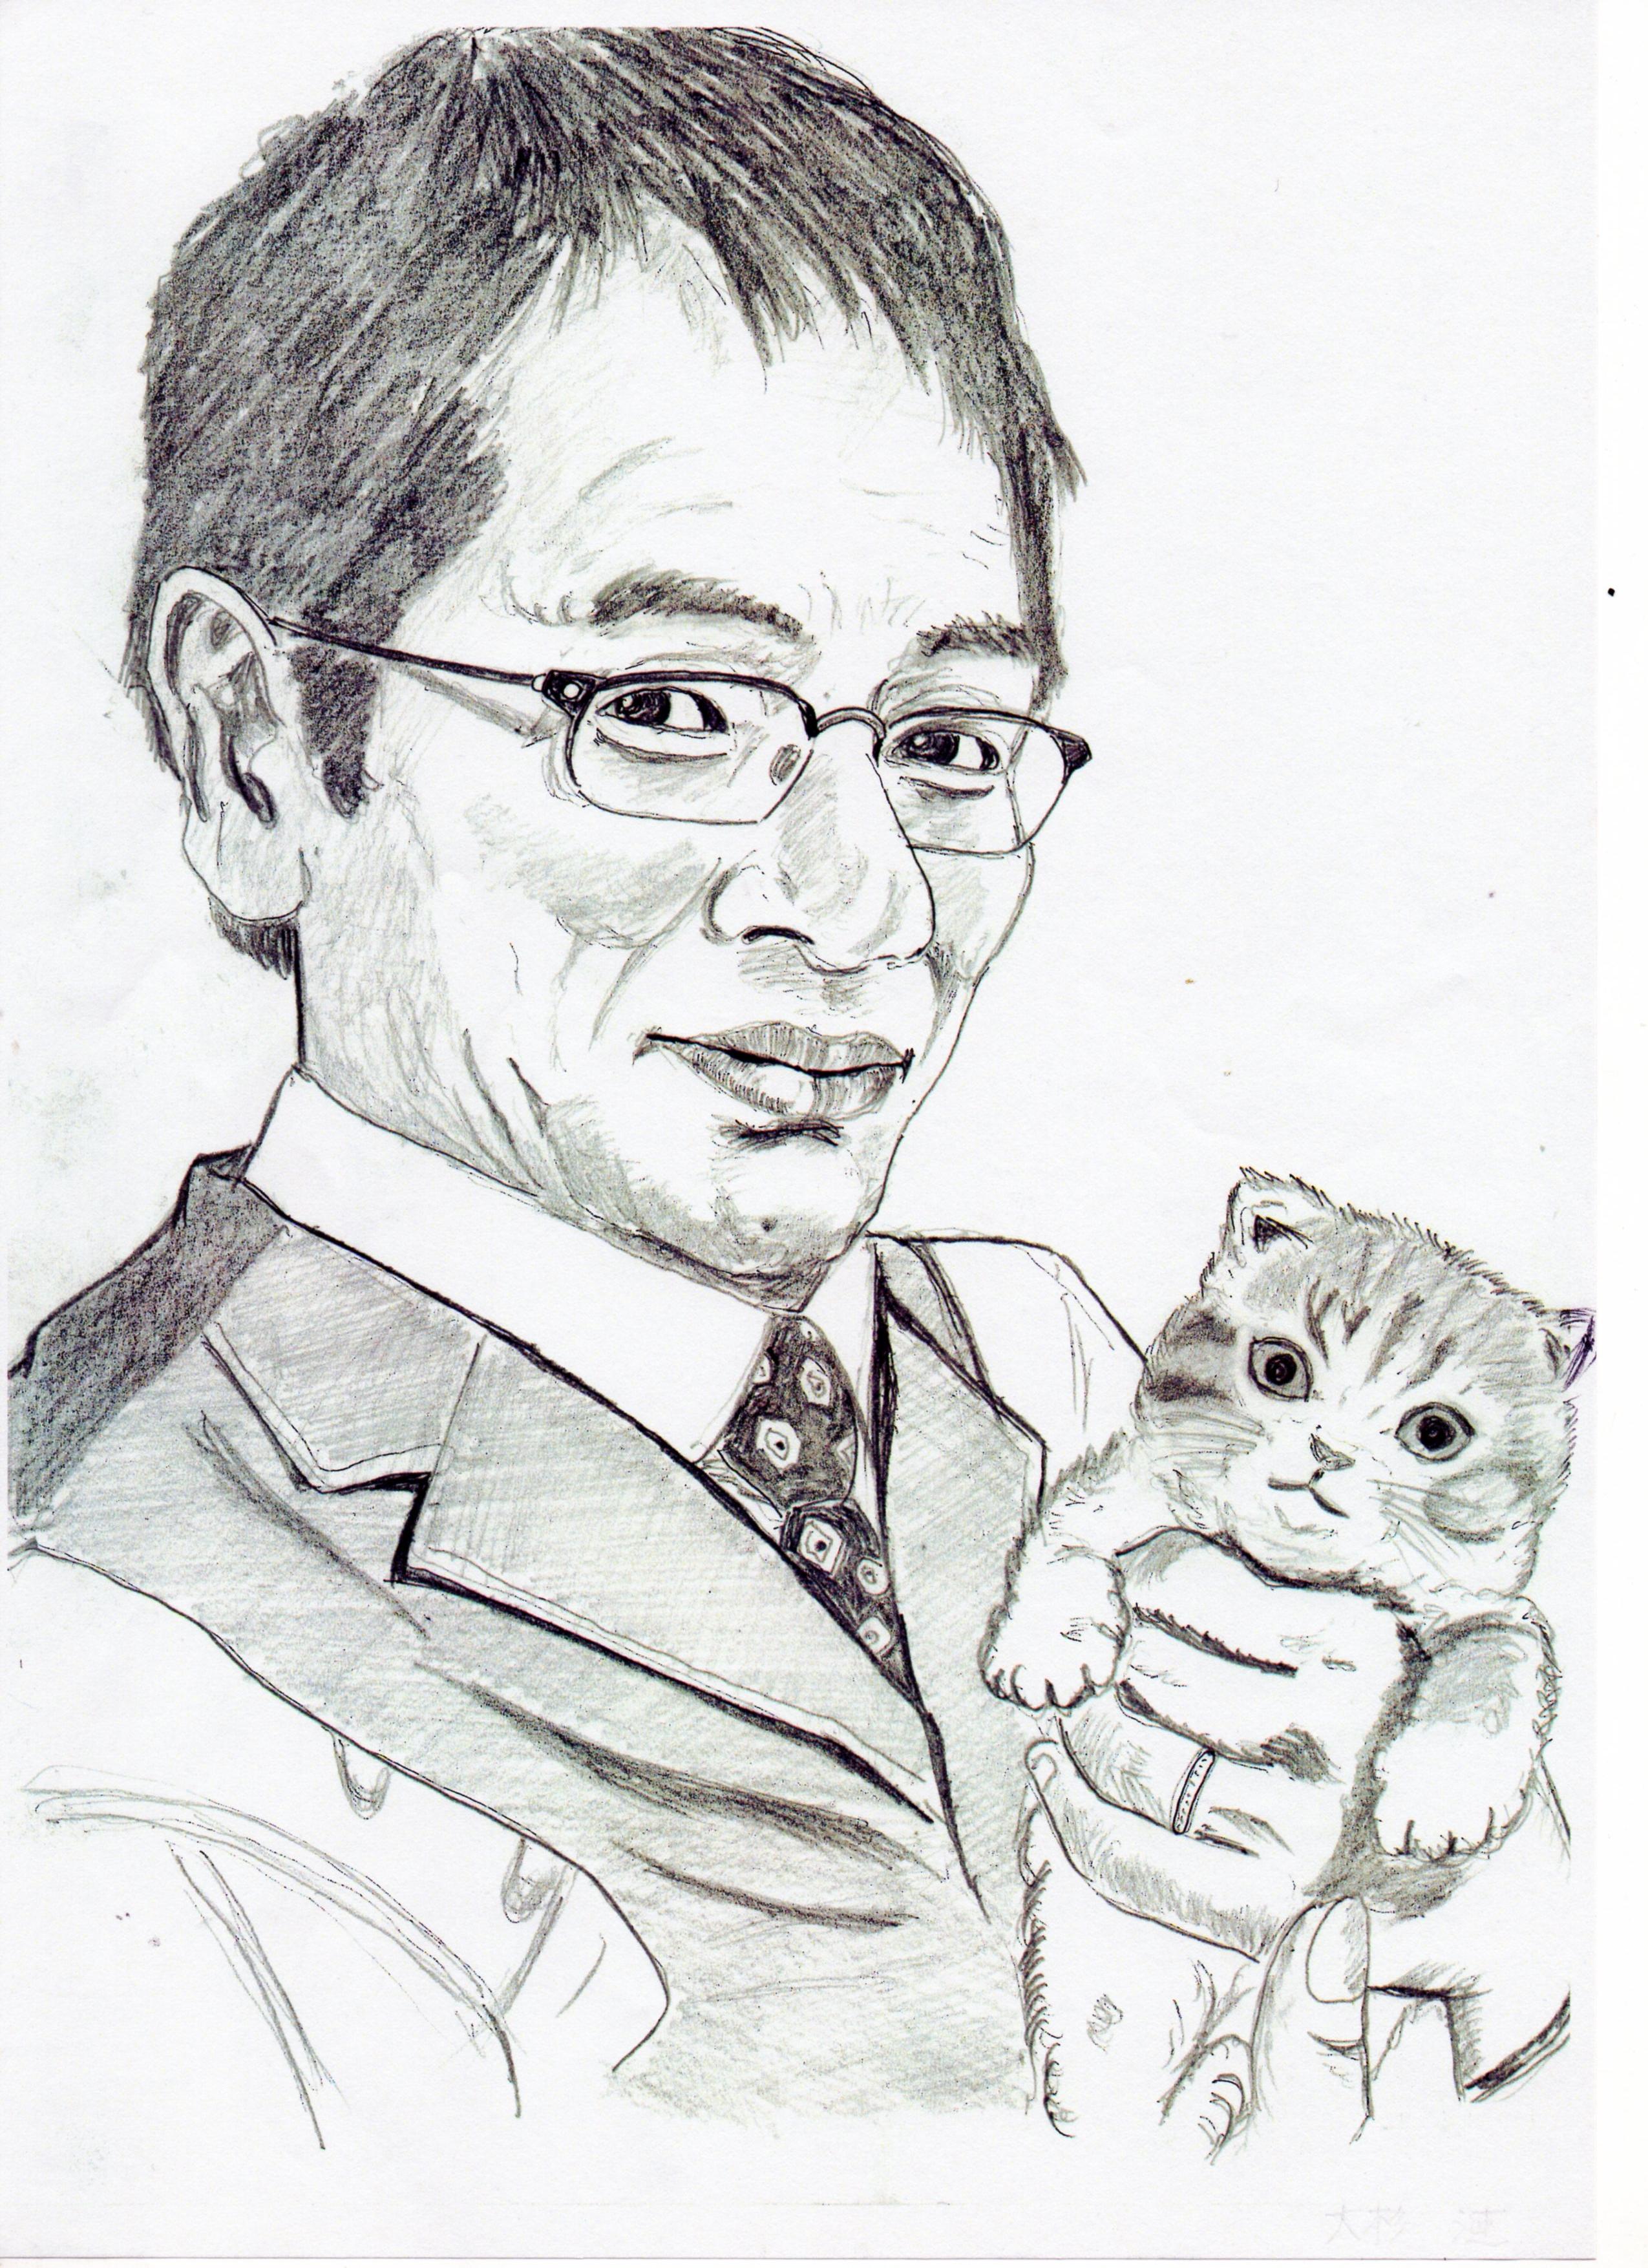 大杉漣の鉛筆画似顔絵